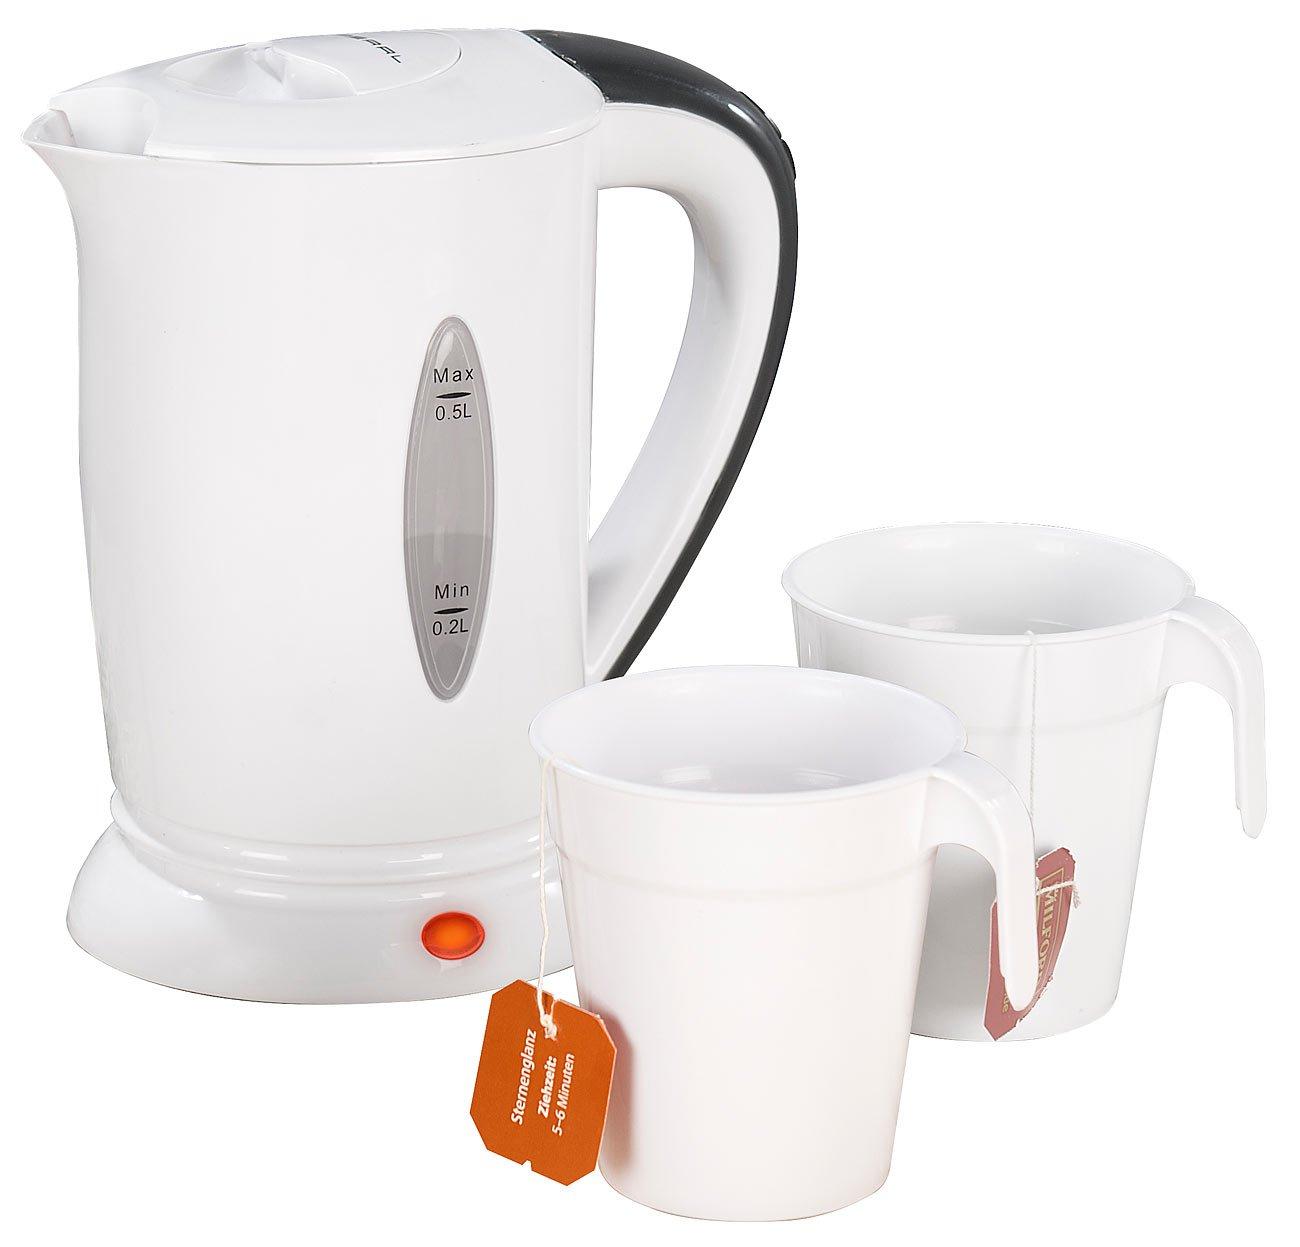 PEARL-Reisewasserkocher-Reise-Wasserkocher-mit-2-Bechern-110230-Volt-650-Watt-500-ml-Mini-Wasserkocher